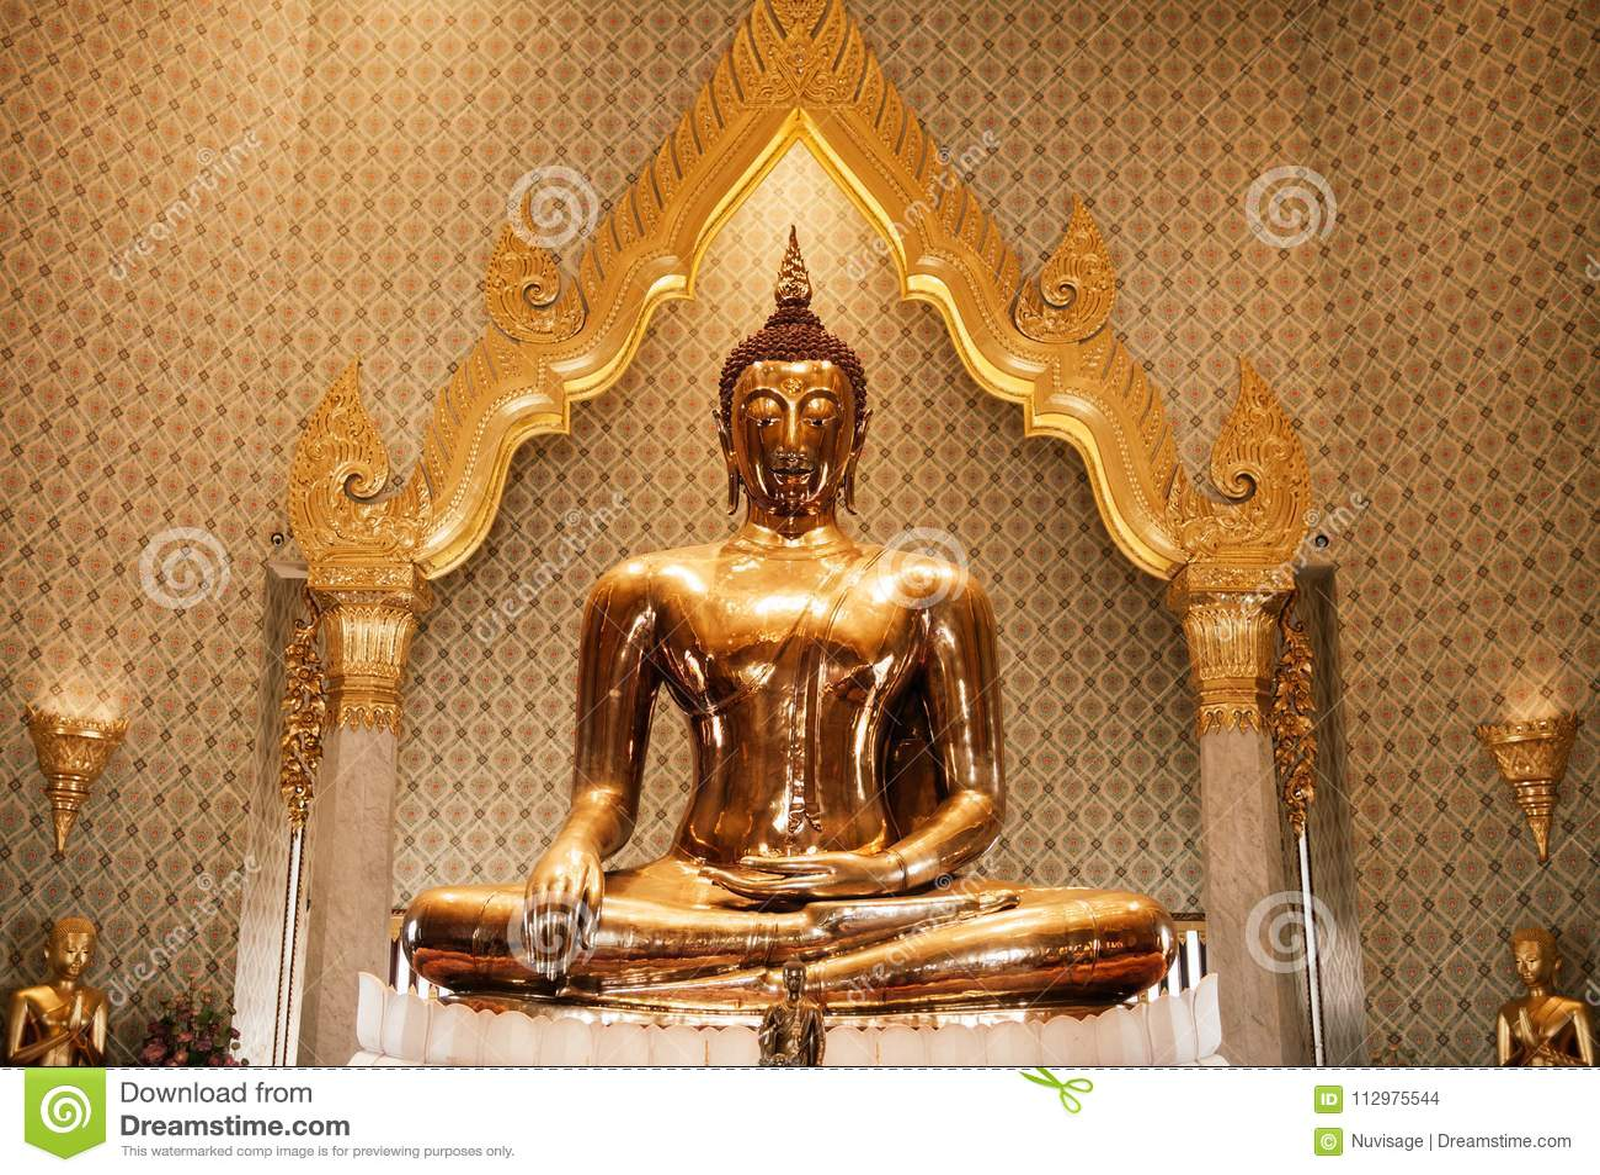 Pure gold Buddha sculpture at Wat Trimitr in China town Bangkok, Thailand